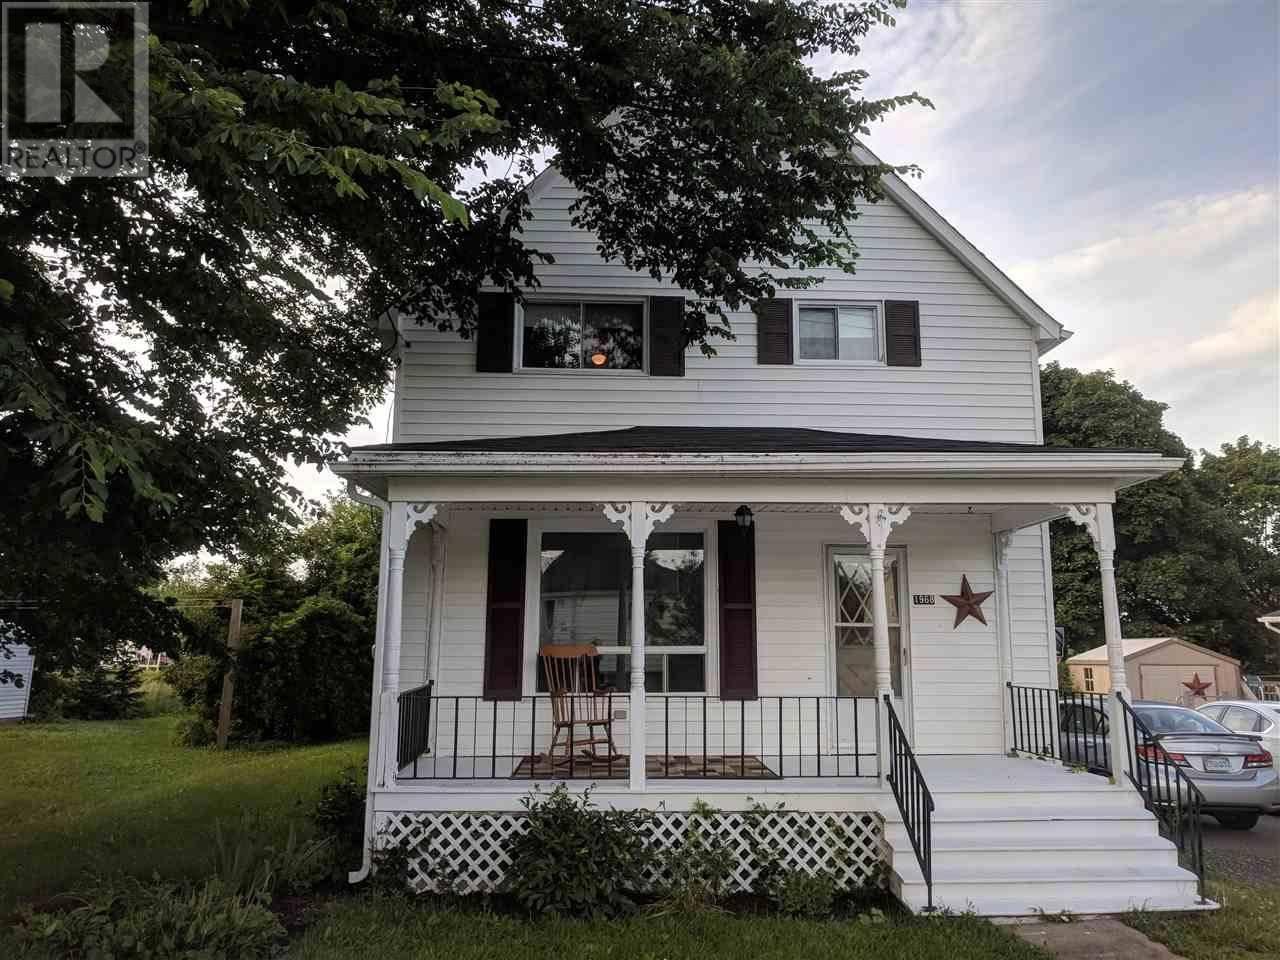 House for sale at 1968 West St Westville Nova Scotia - MLS: 202007078